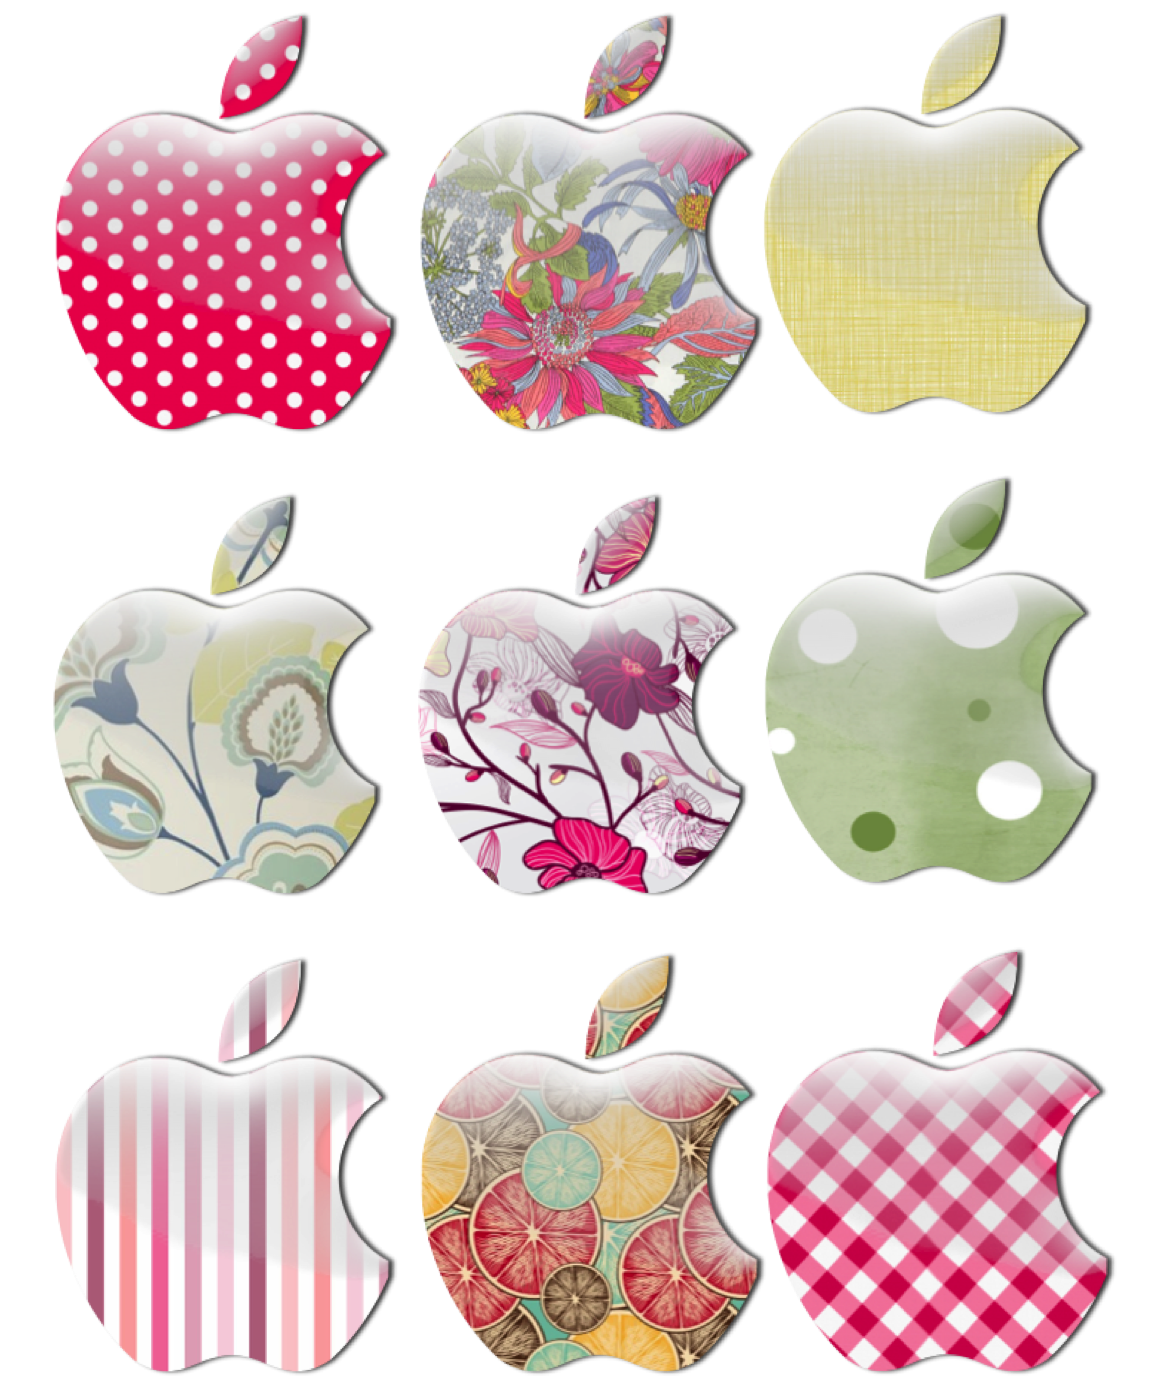 Manzanas decoradas